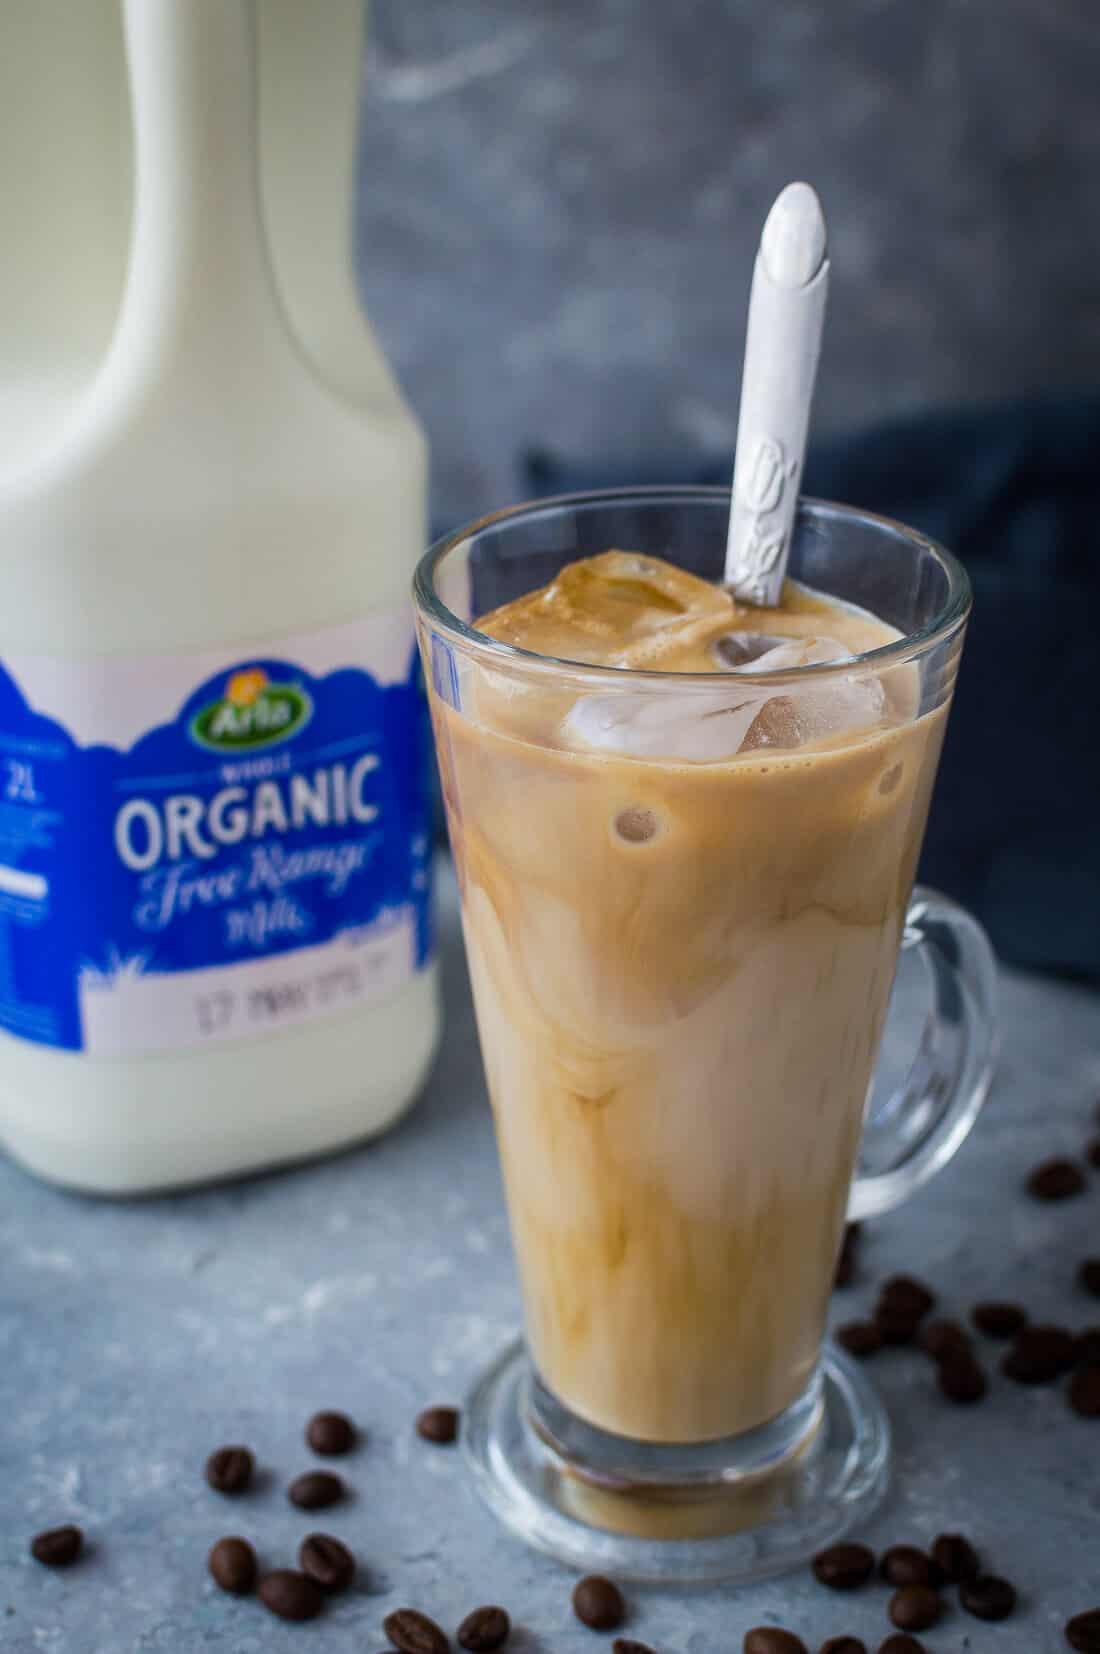 iced coffee with Arla organic whole milk